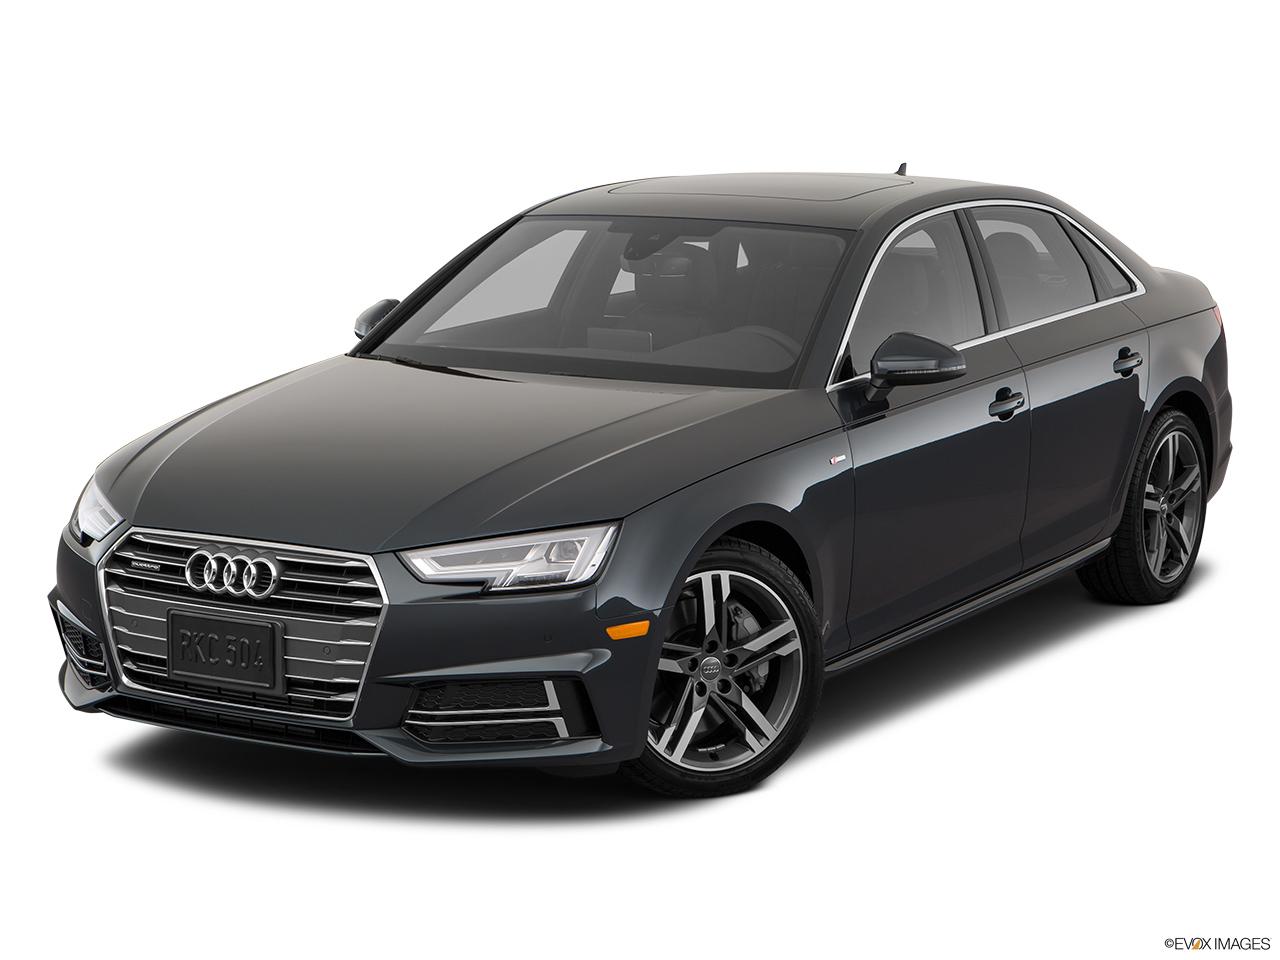 audi a4 2018 45 tfsi quattro sport 252 hp in qatar new. Black Bedroom Furniture Sets. Home Design Ideas